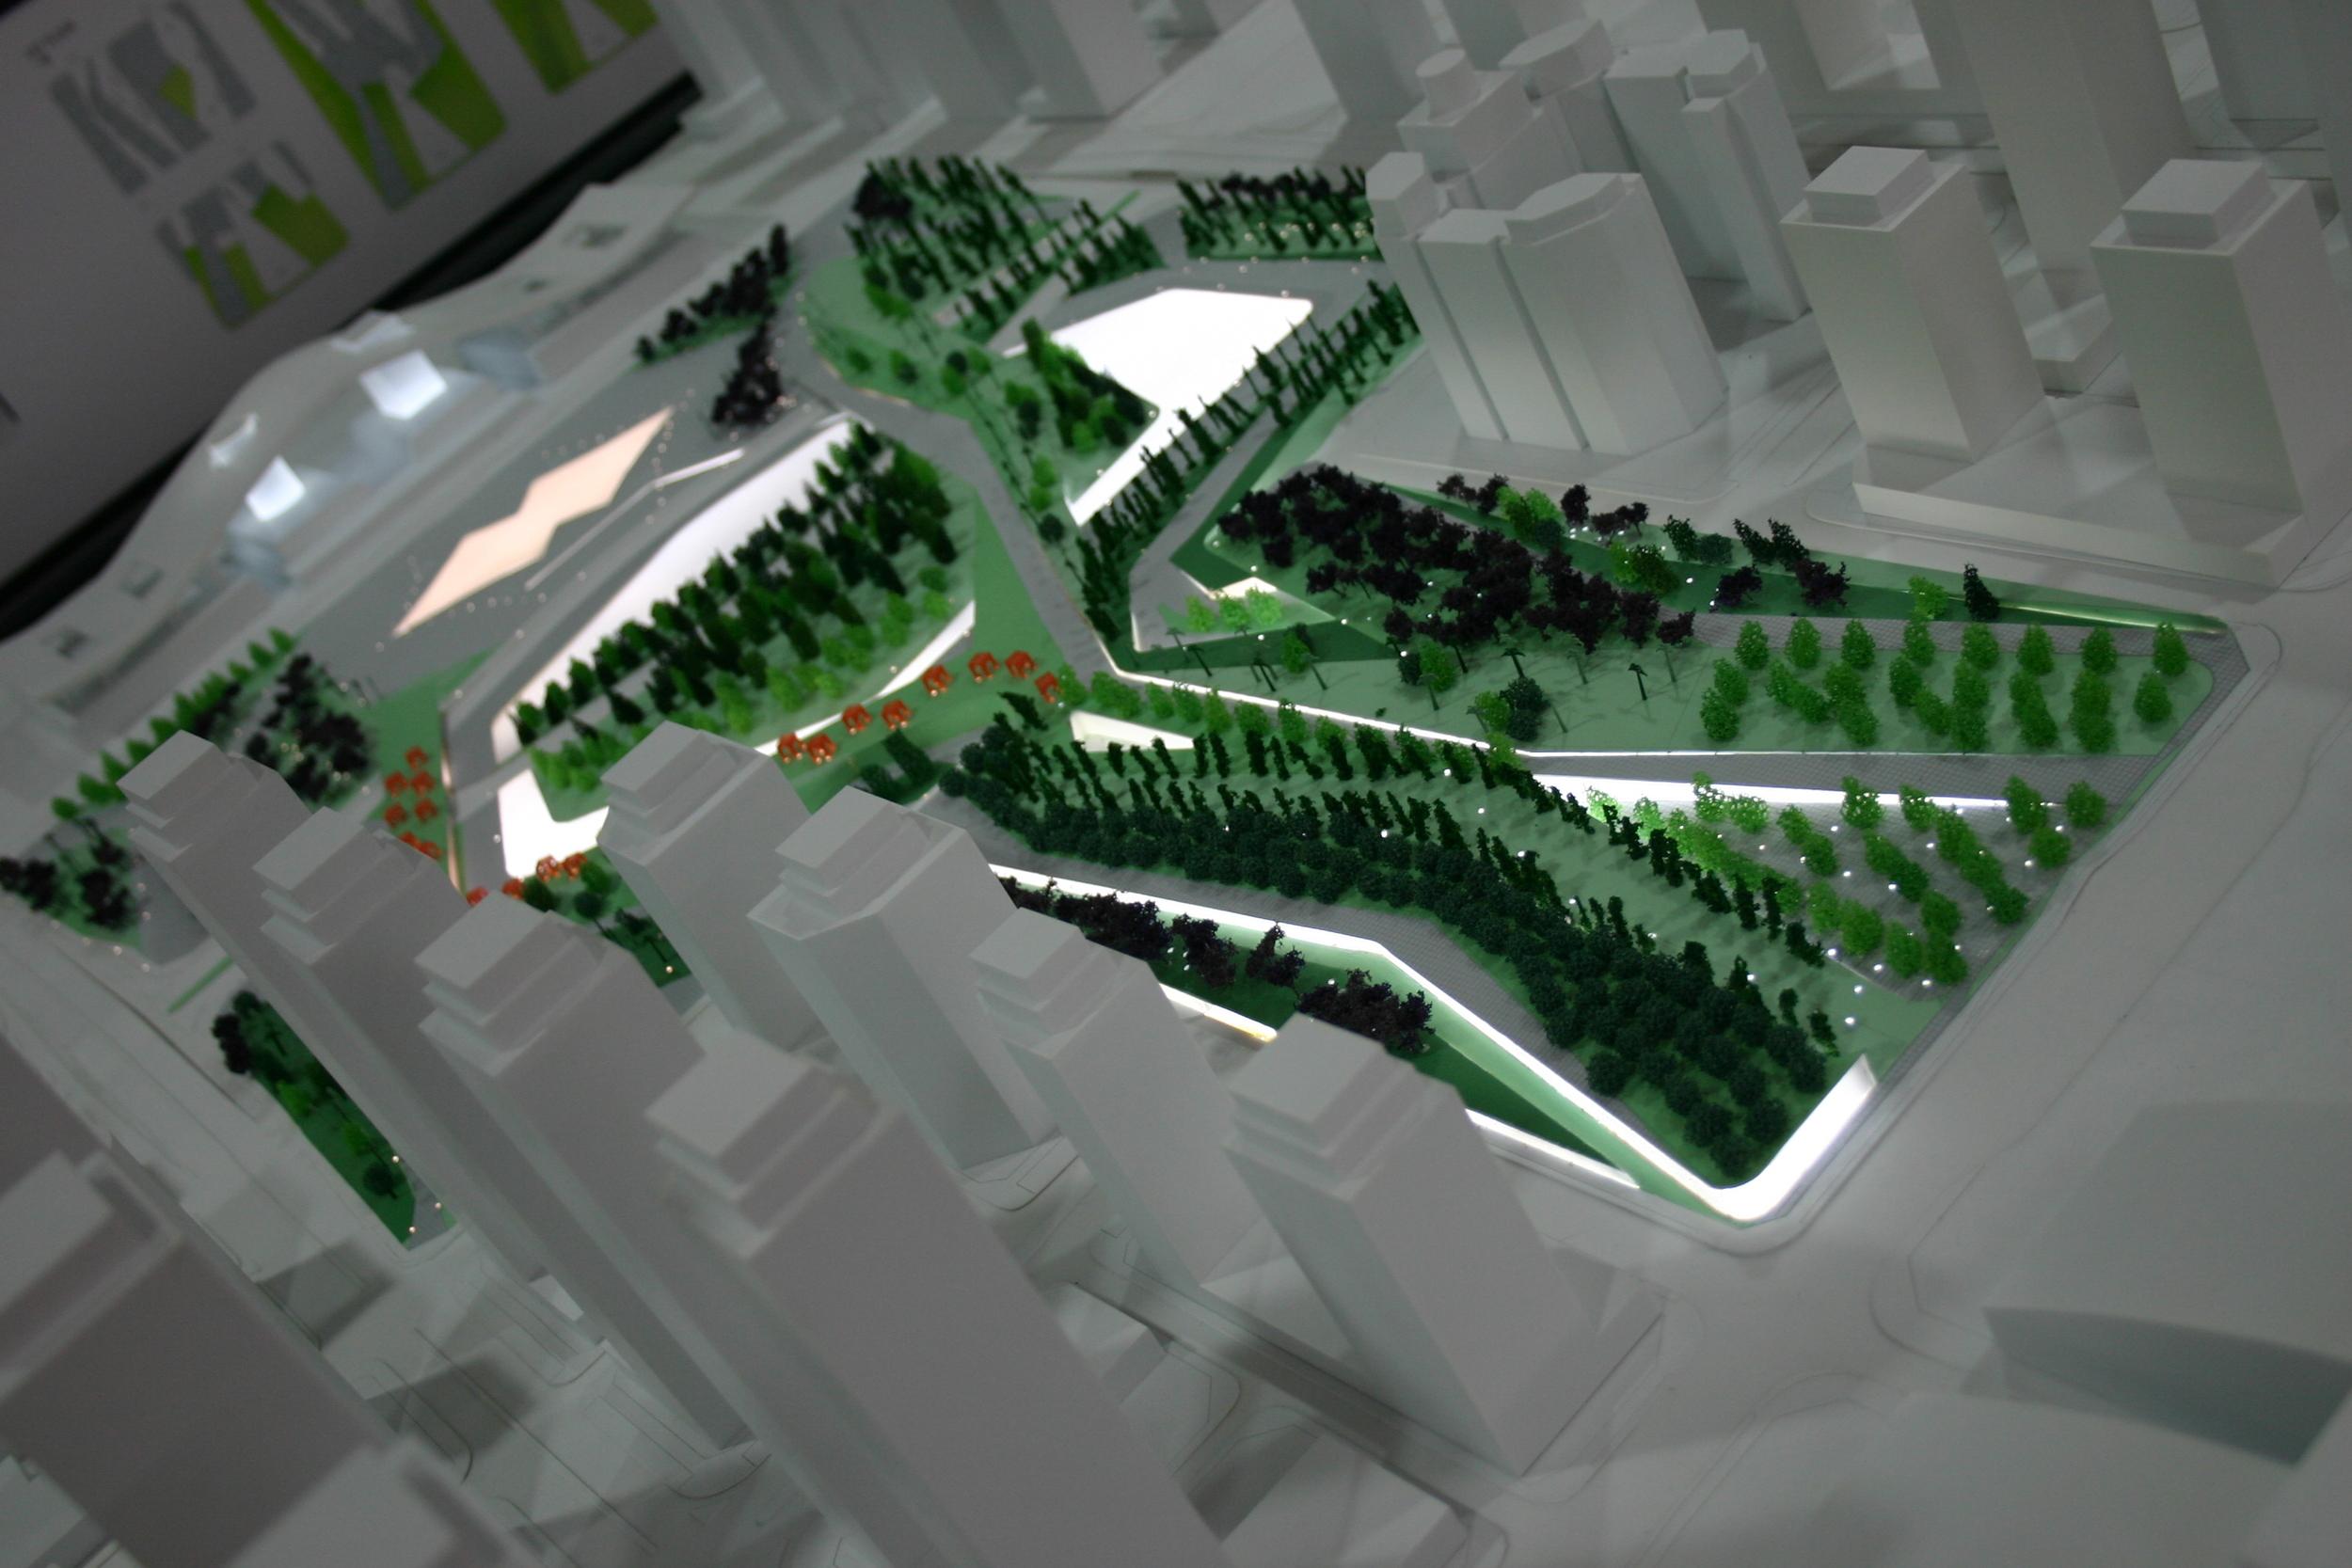 BA_shenzhenpark_view aerial night2_MAD Architects.JPG